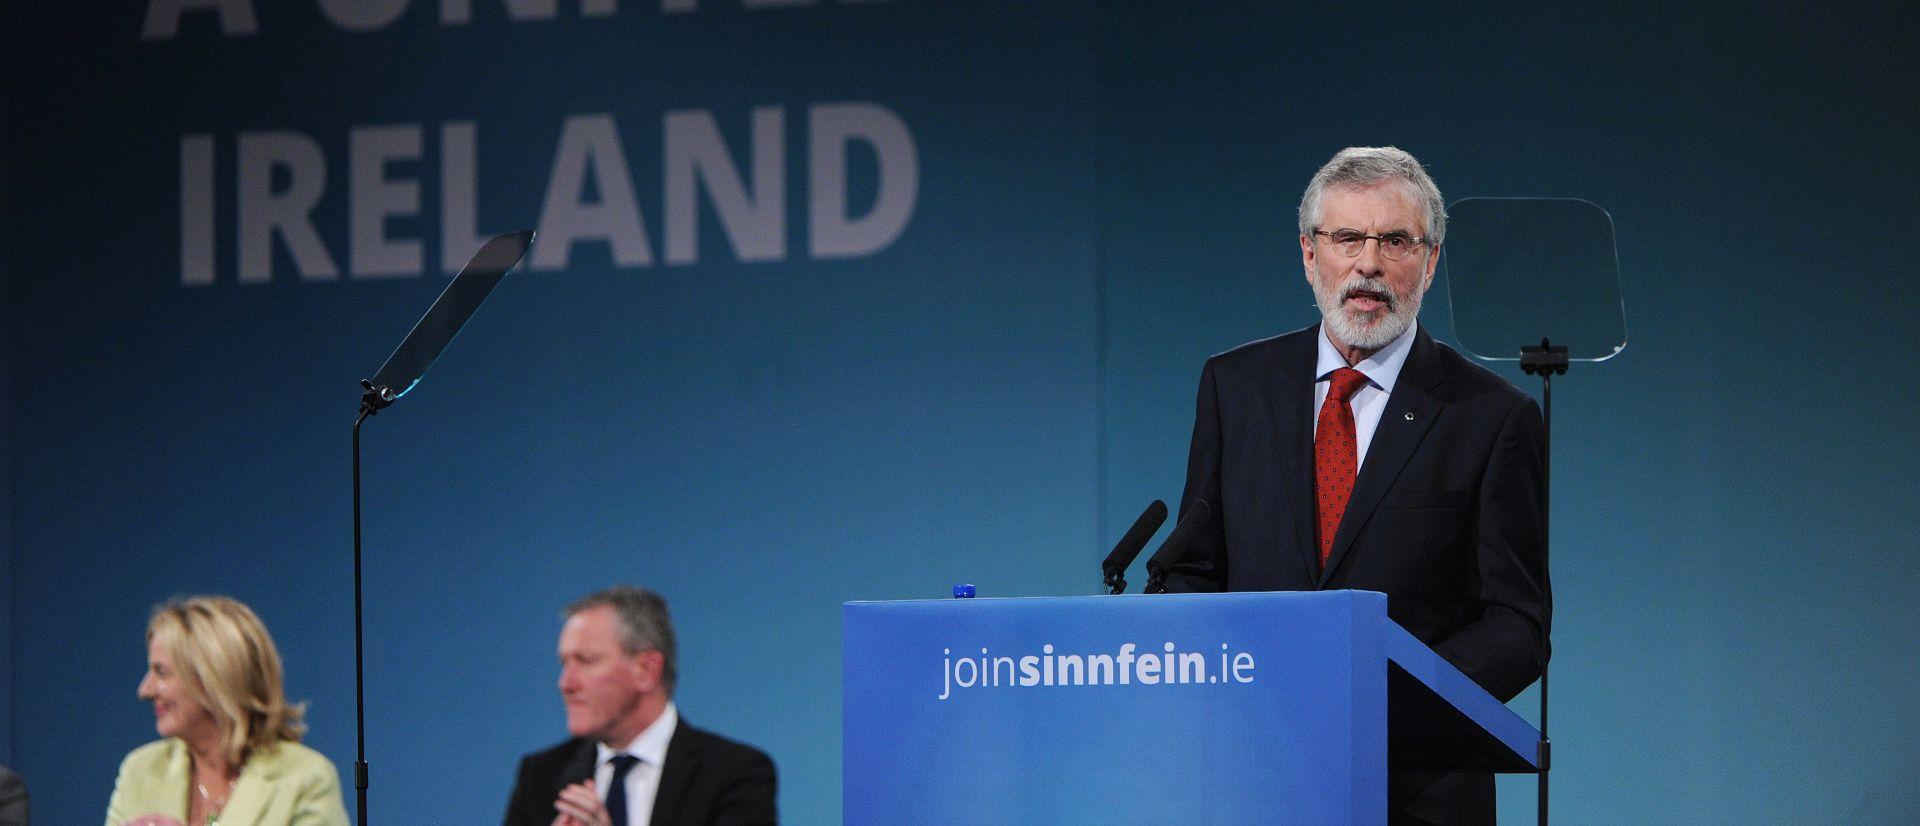 Gerry Adams, javno lice IRA-e i mirotvorac, napušta čelništvo Sinn Feina